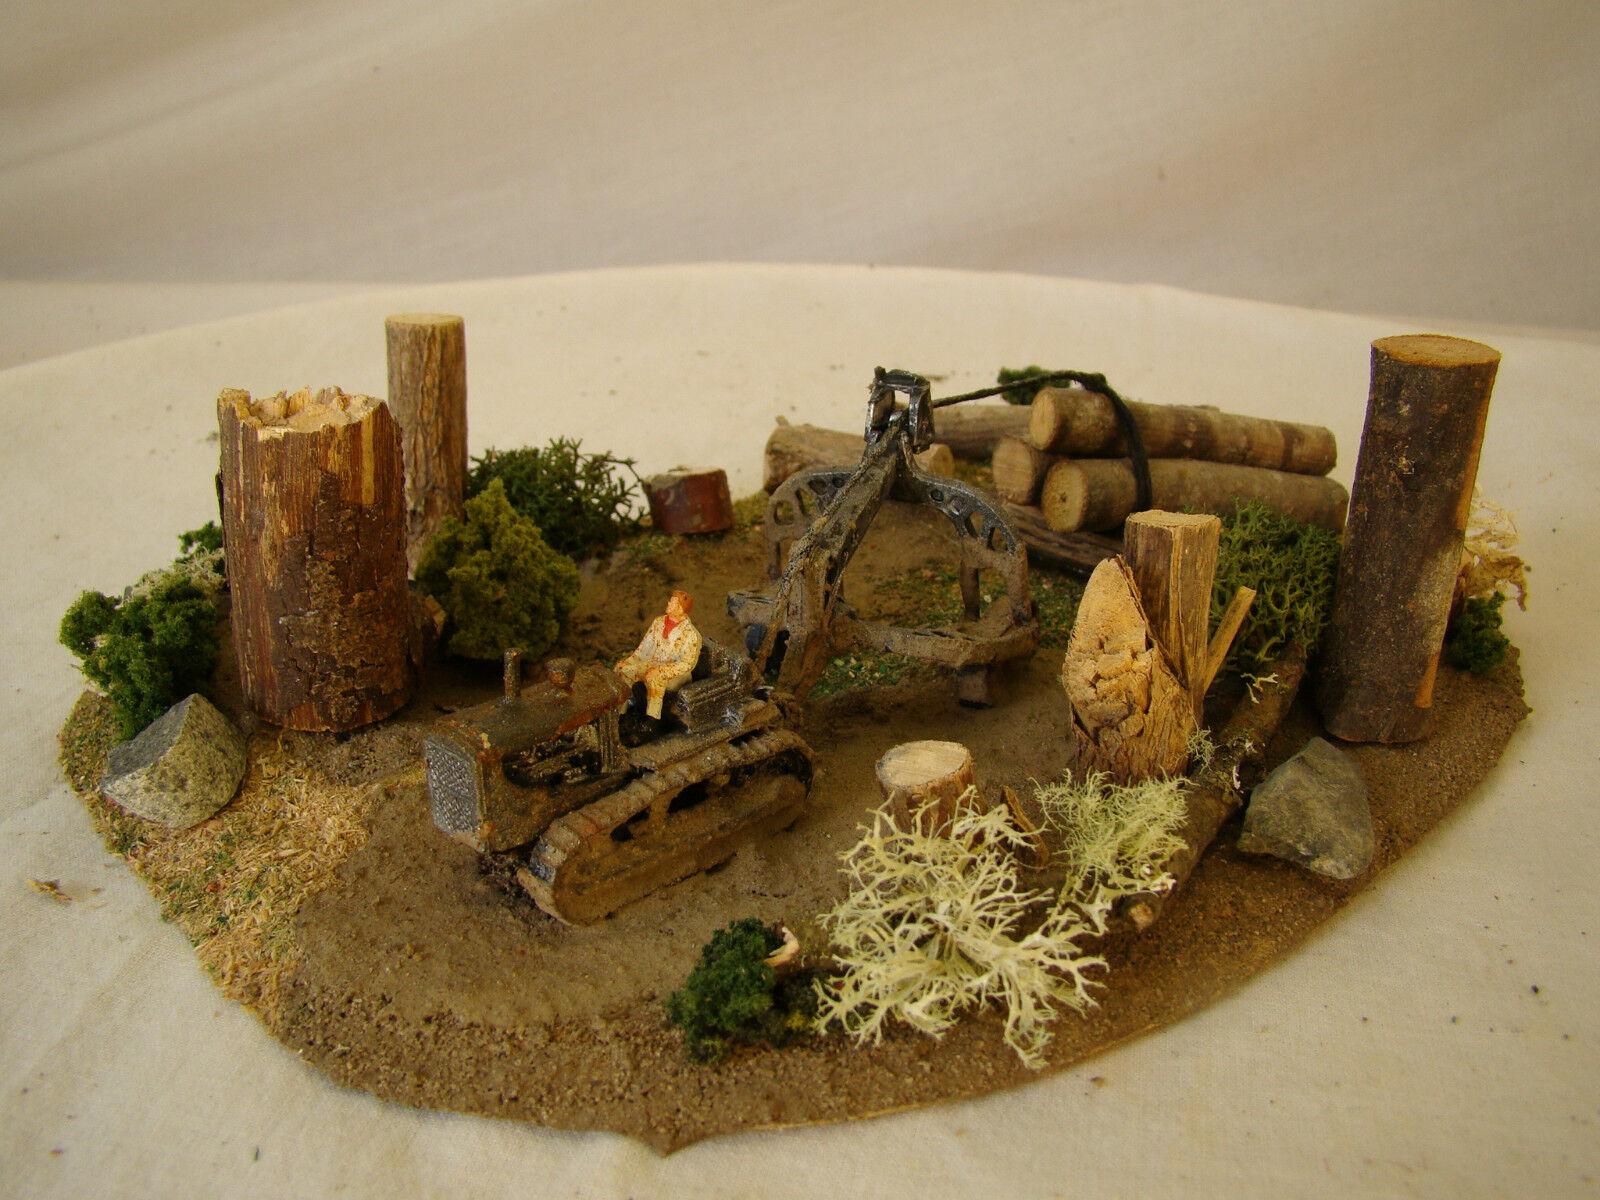 Home Home Home bulldozer taladro - Historical Pictures - personalización del viento - serie 16 978